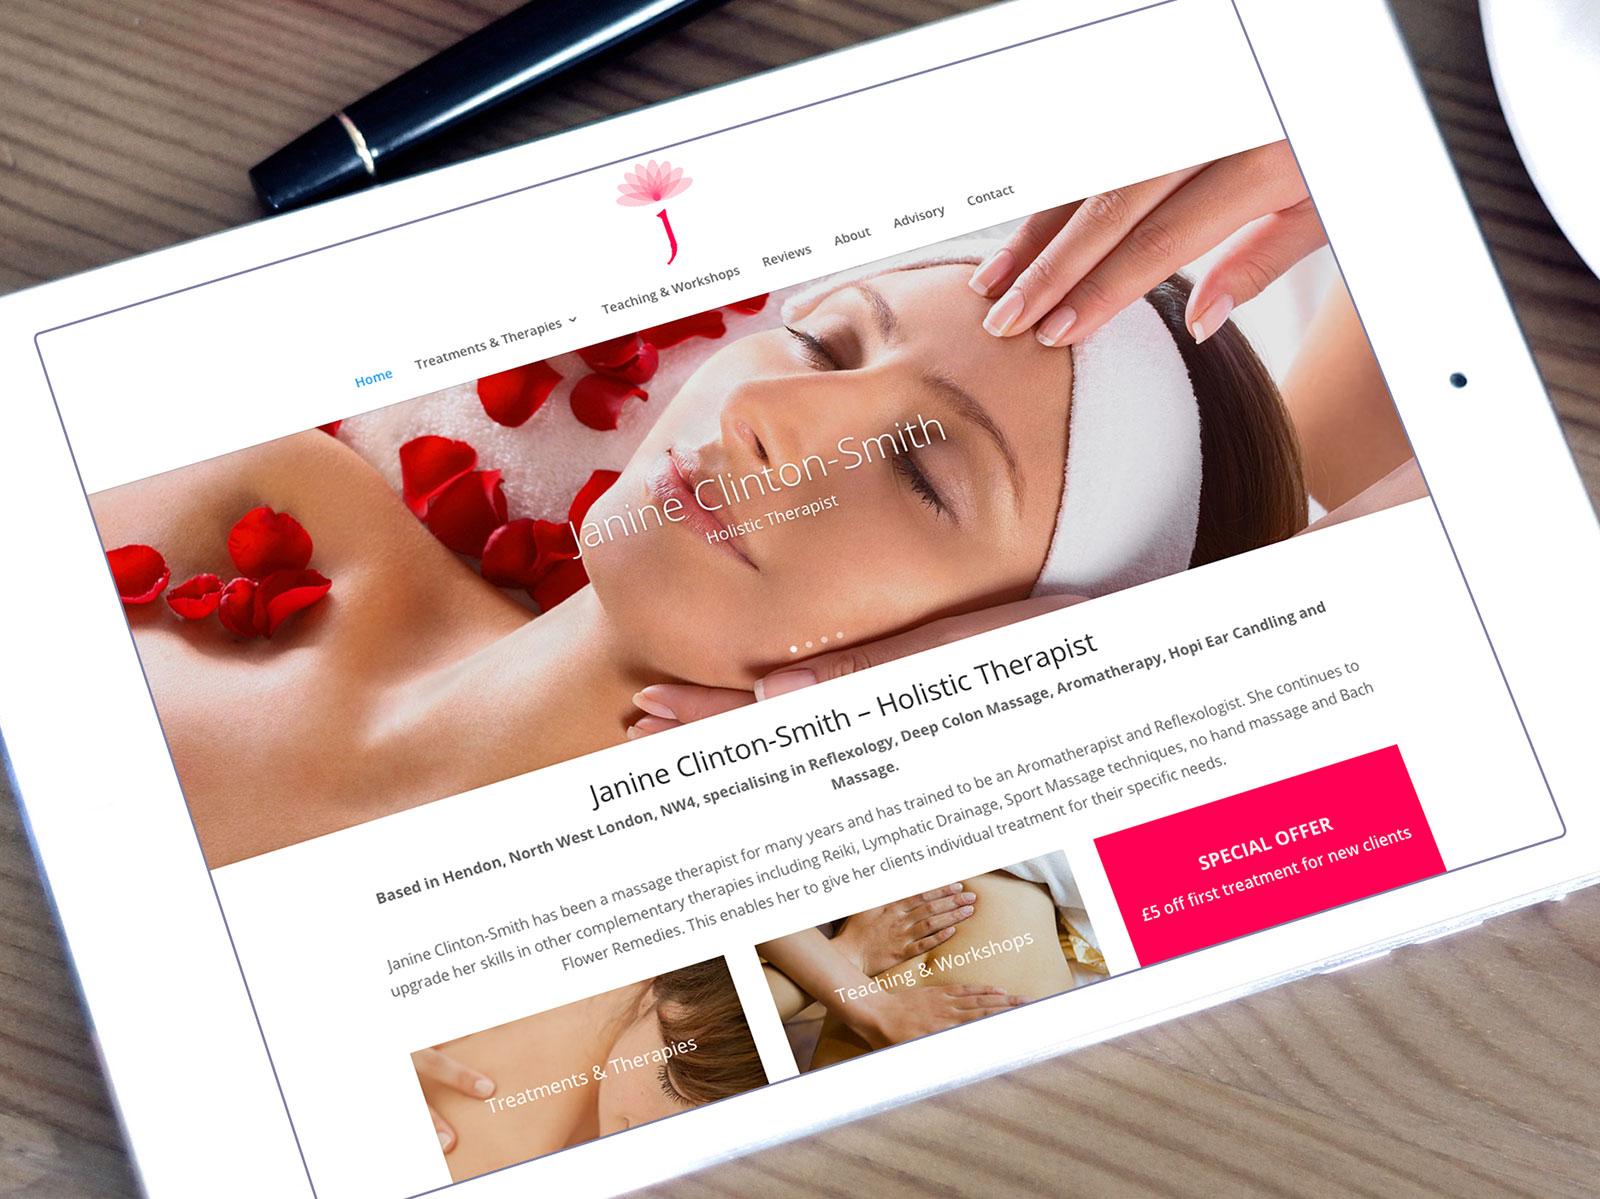 Janine Clinton-Smith Website Design